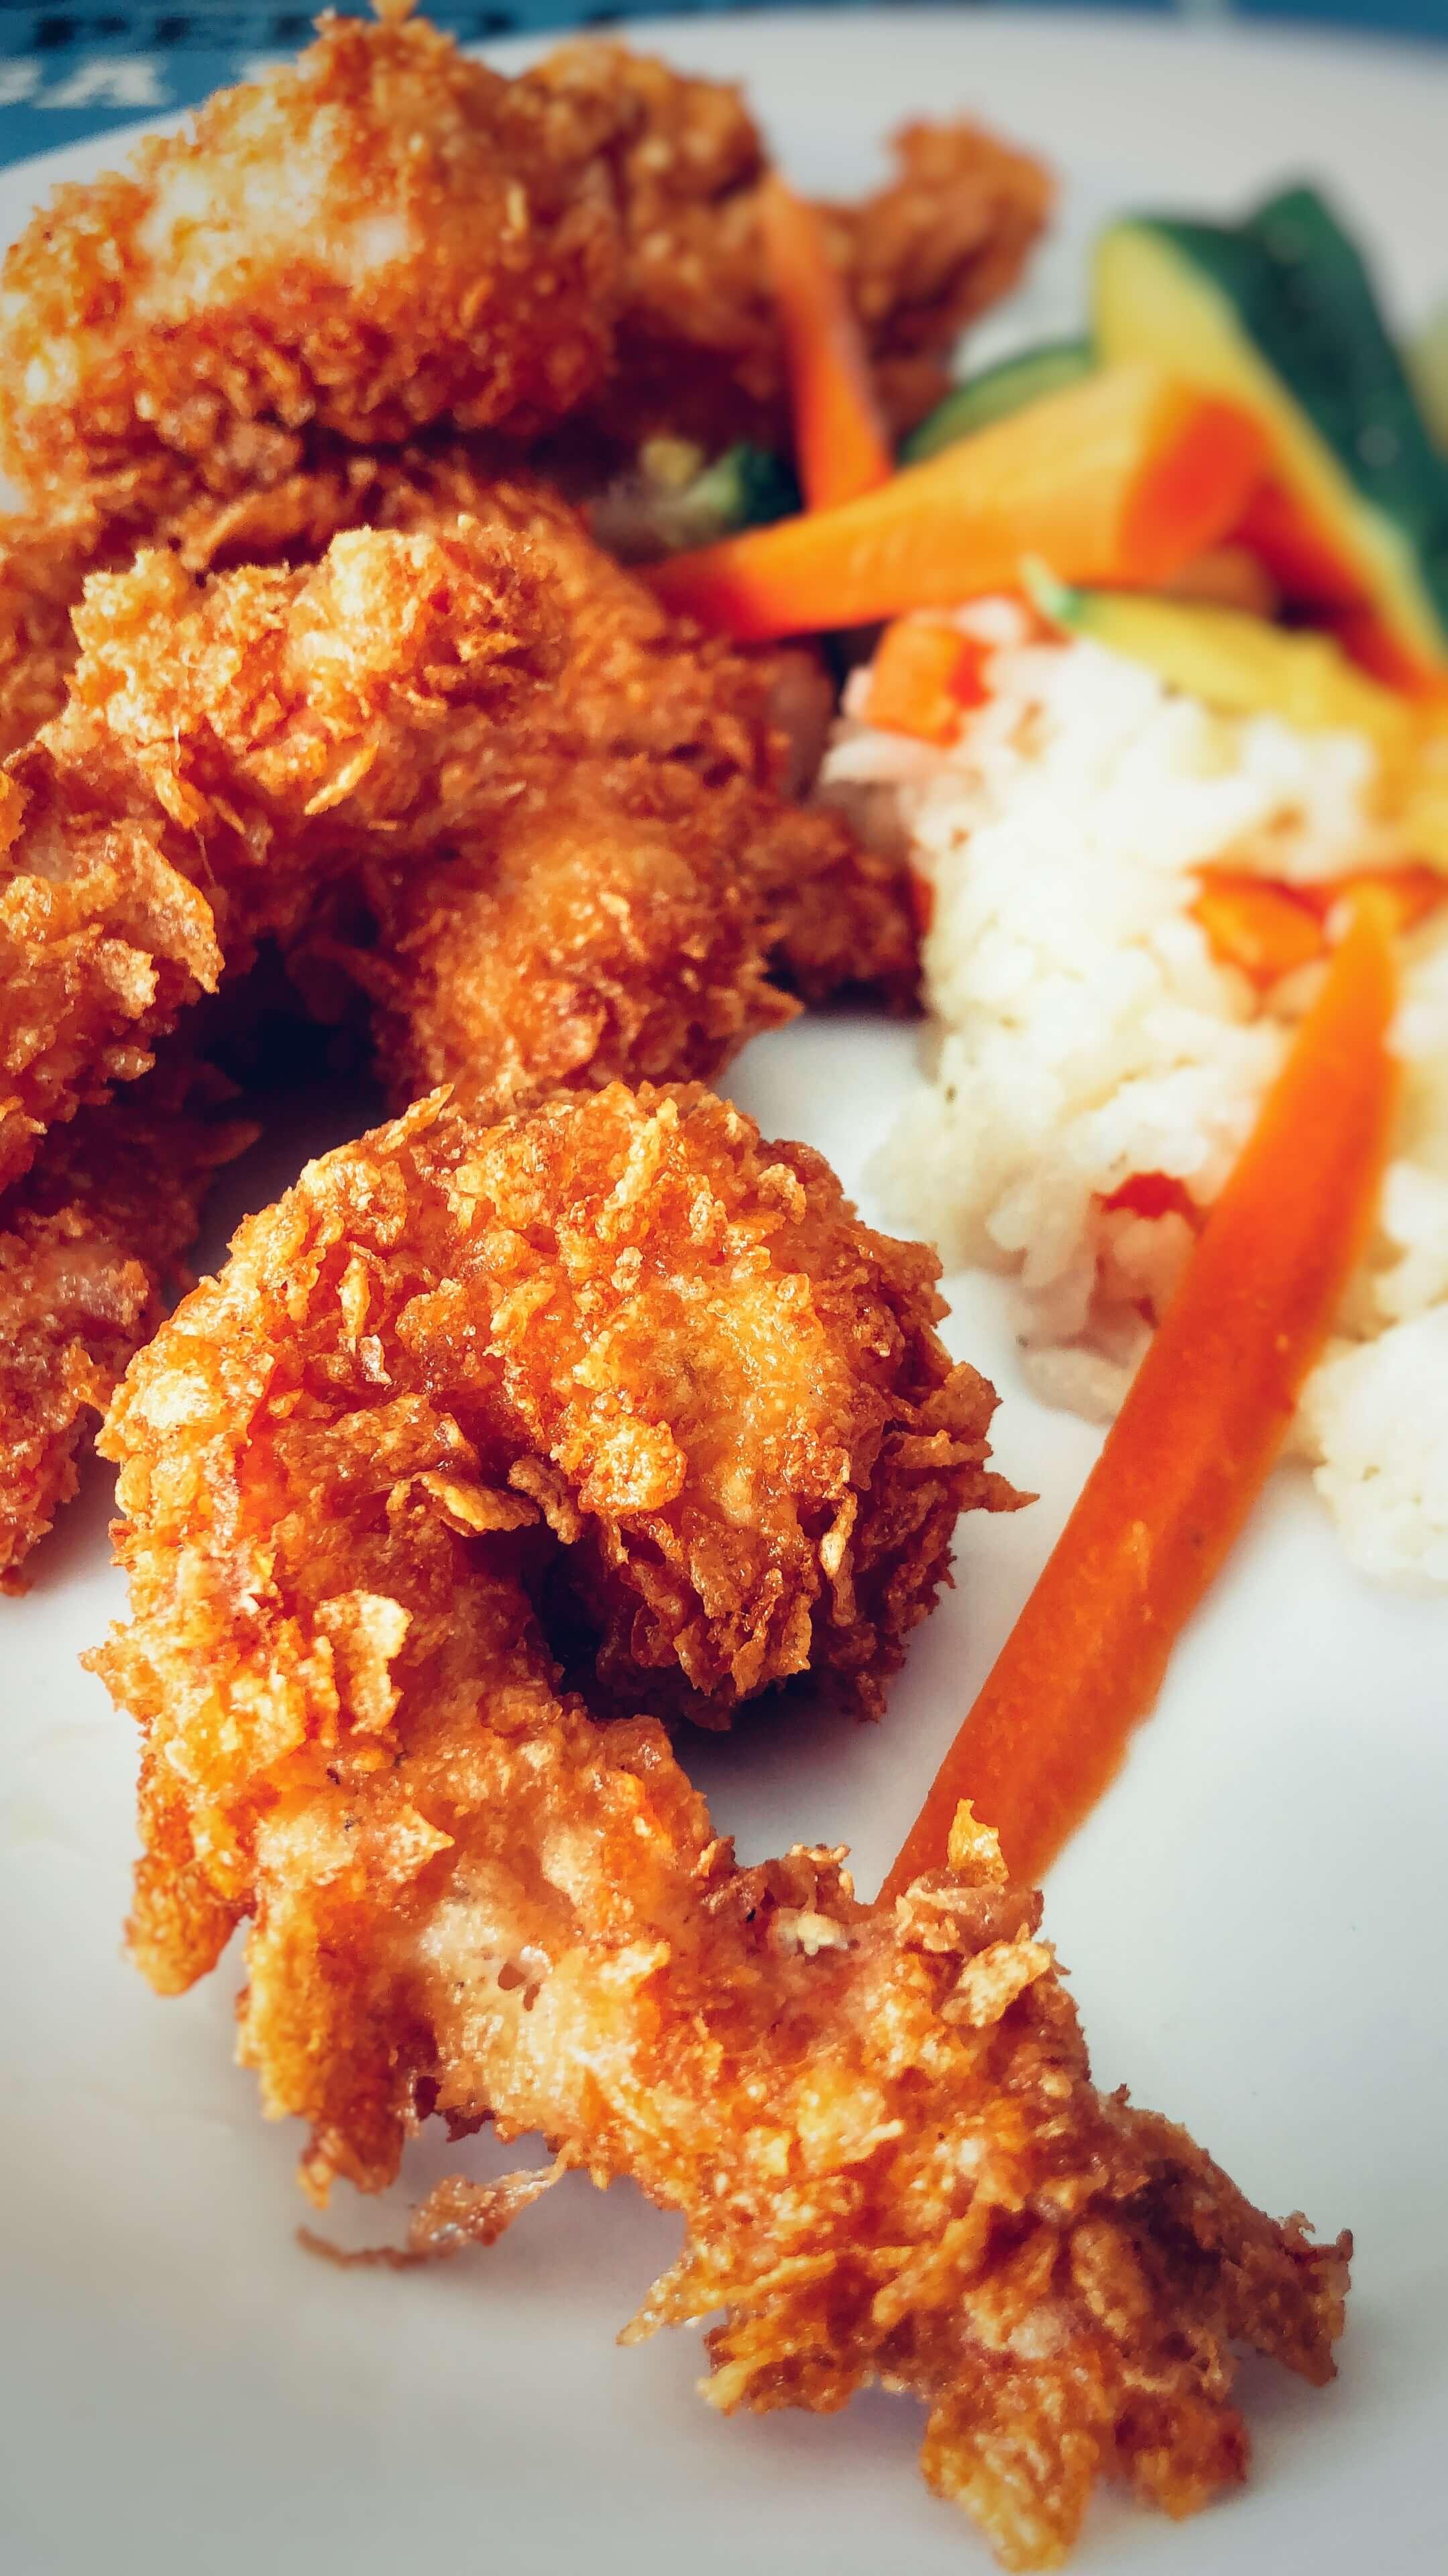 Best Tulum restaurants where to eat in Tulum